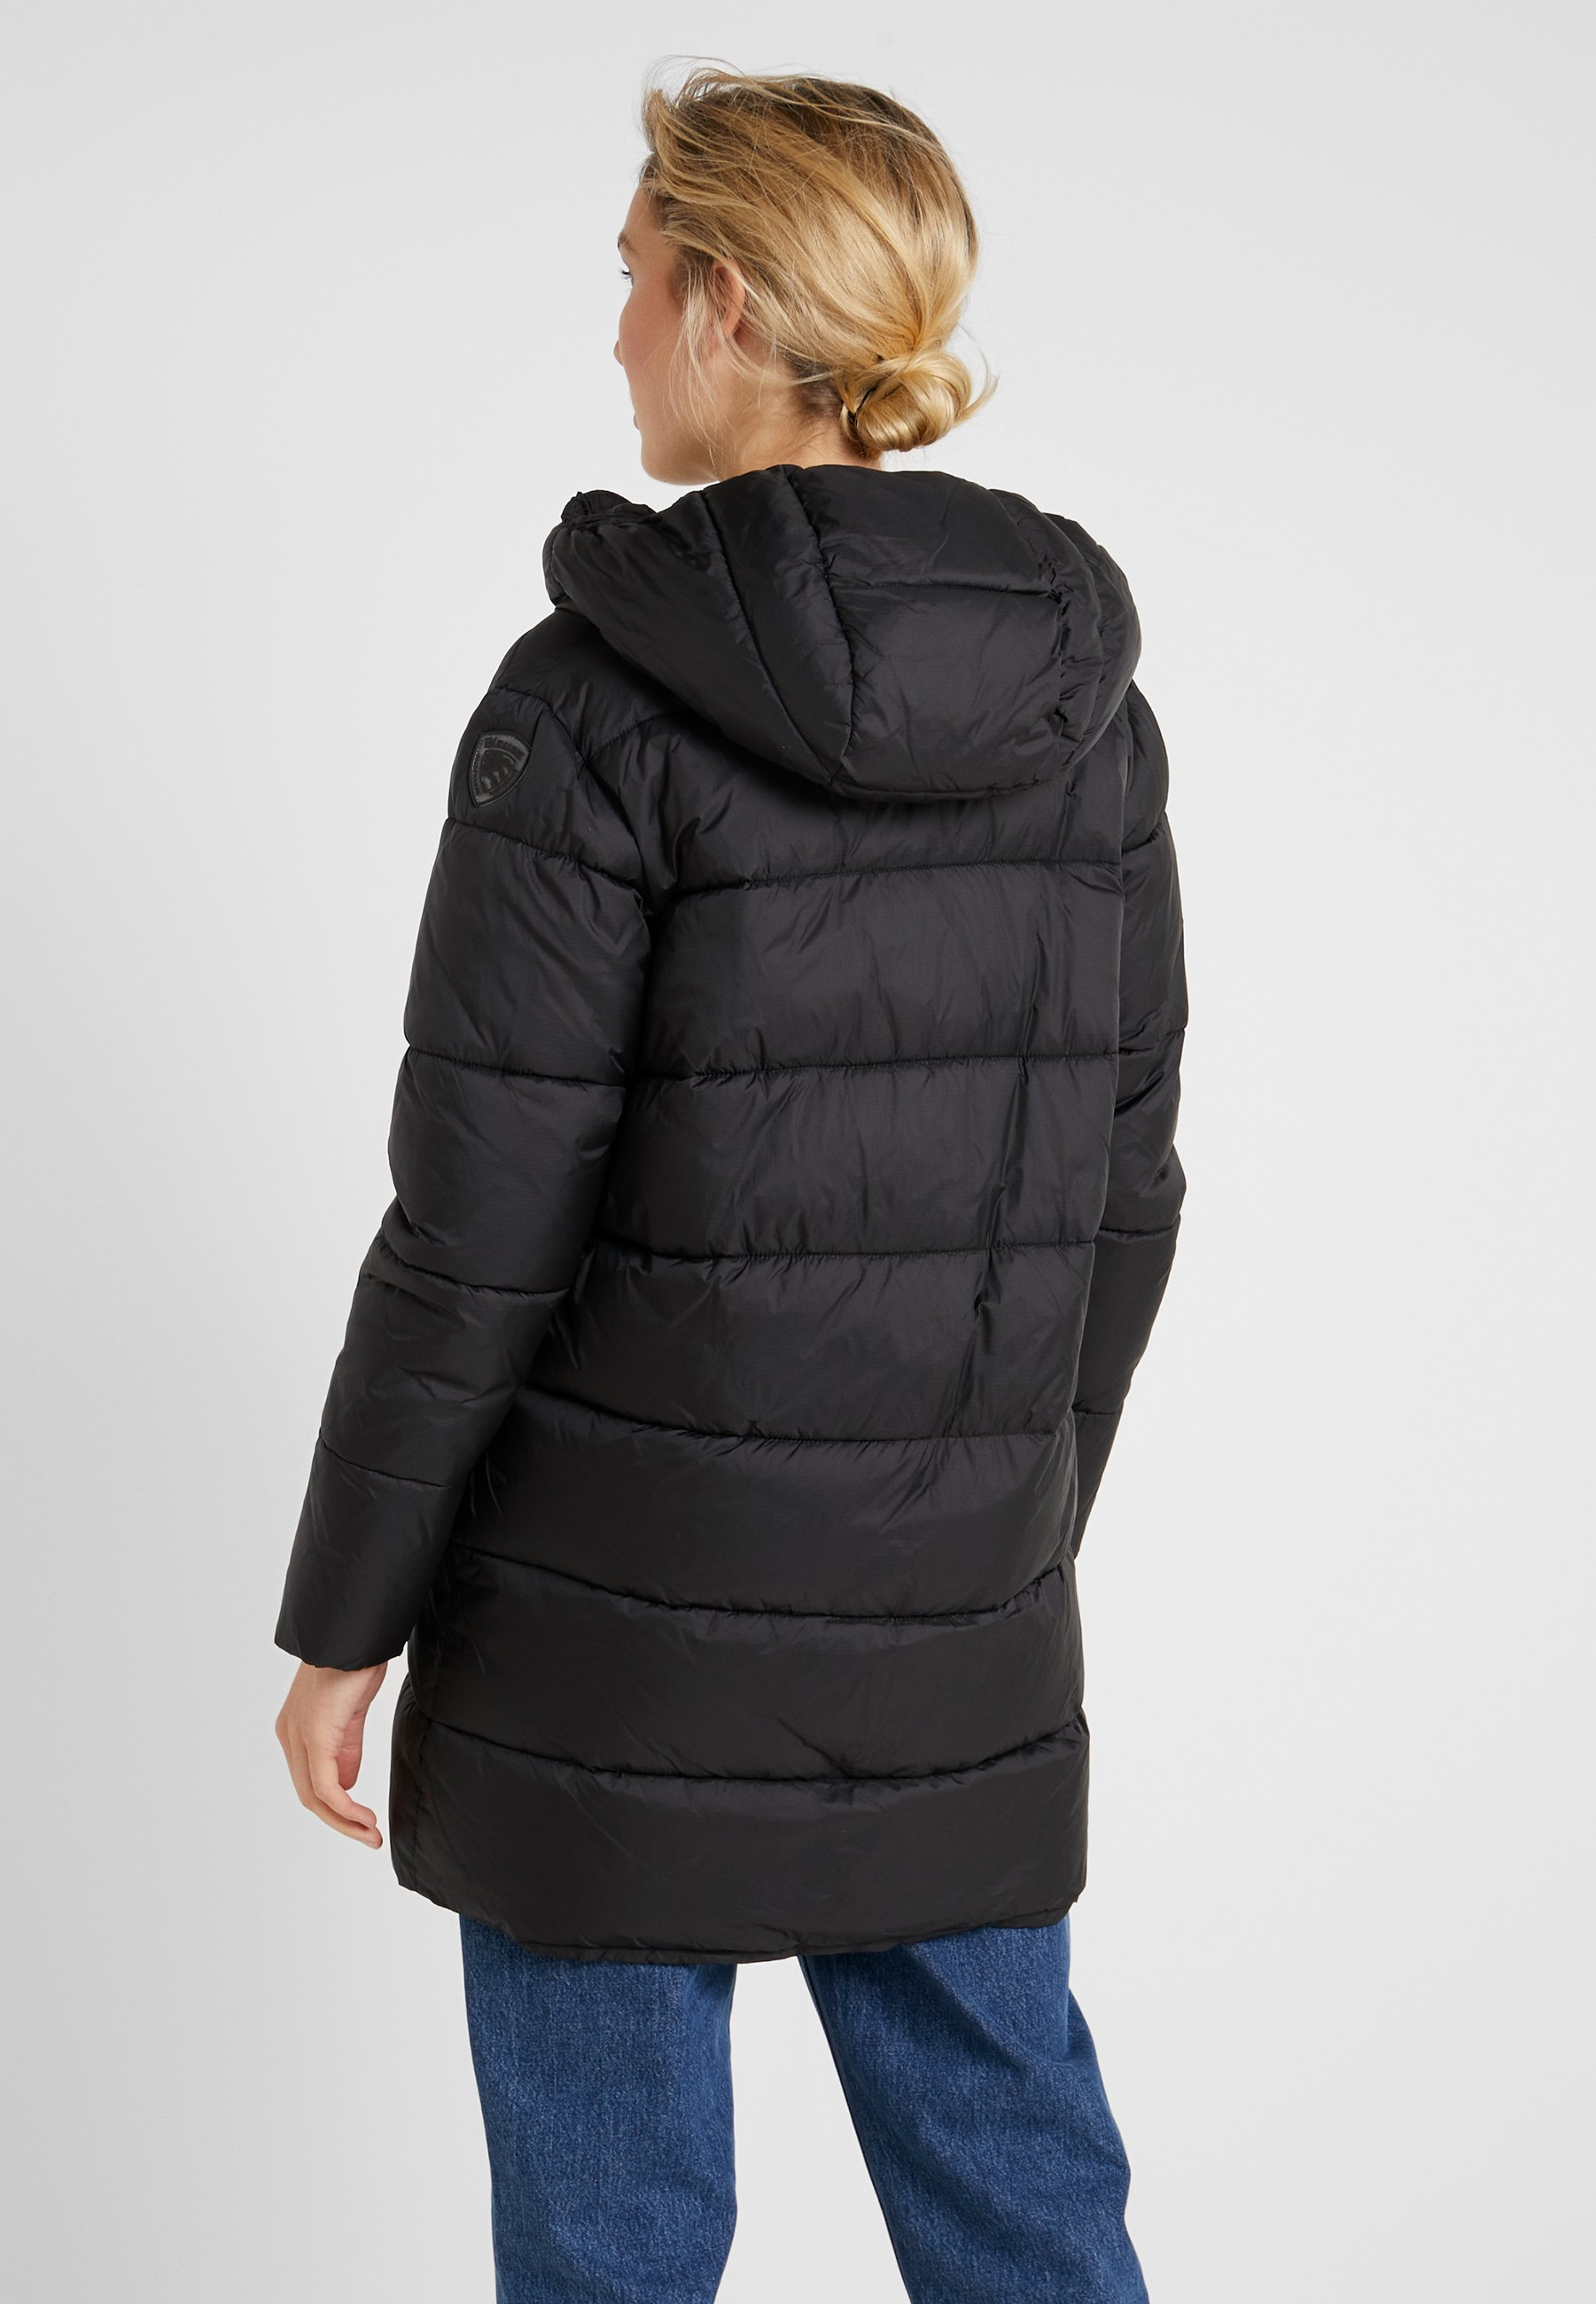 Blauer Lunghi OvattaVeste Impermeabile Imbottito Black D'hiver WHIED29